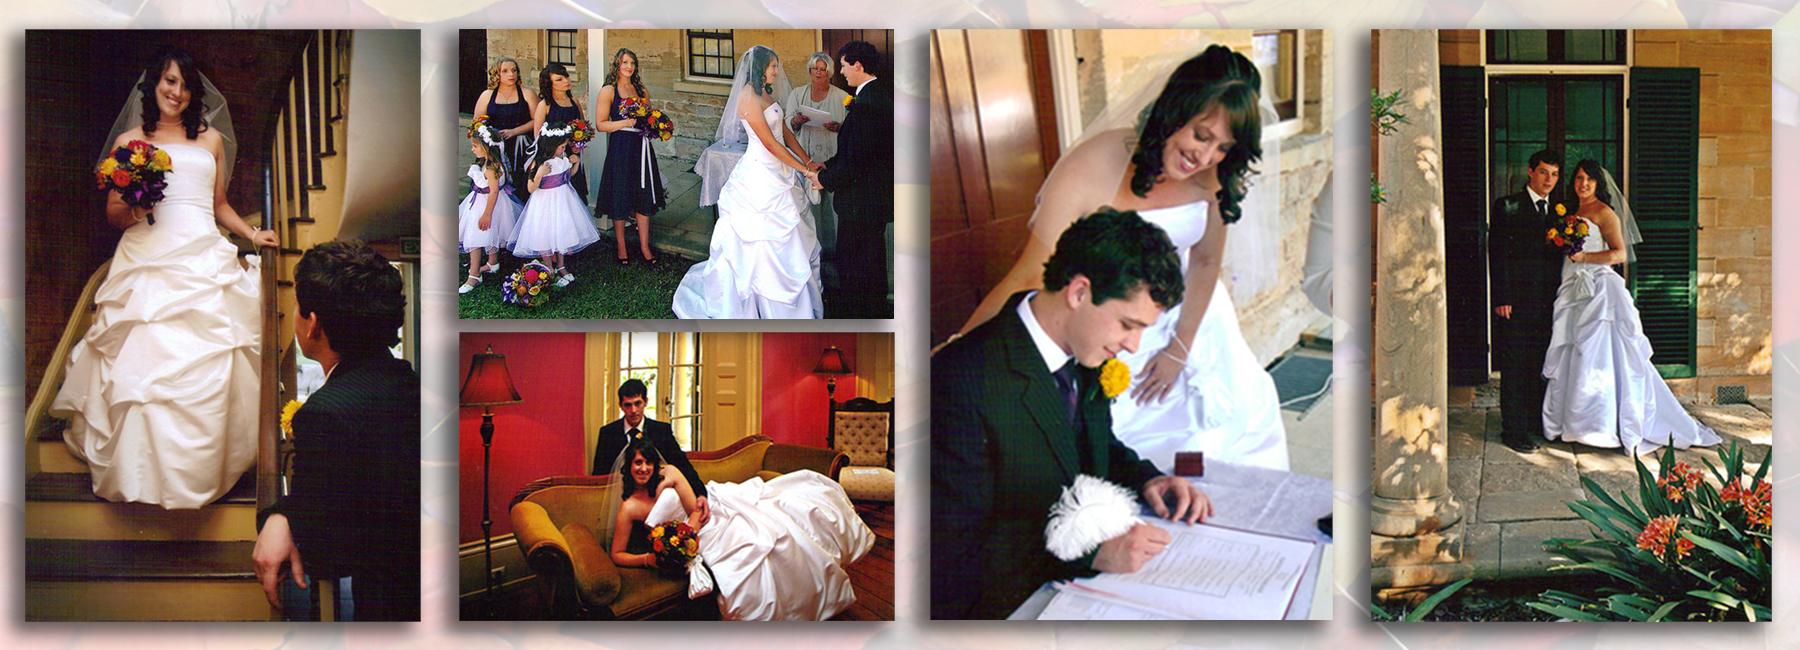 Talia martino wedding